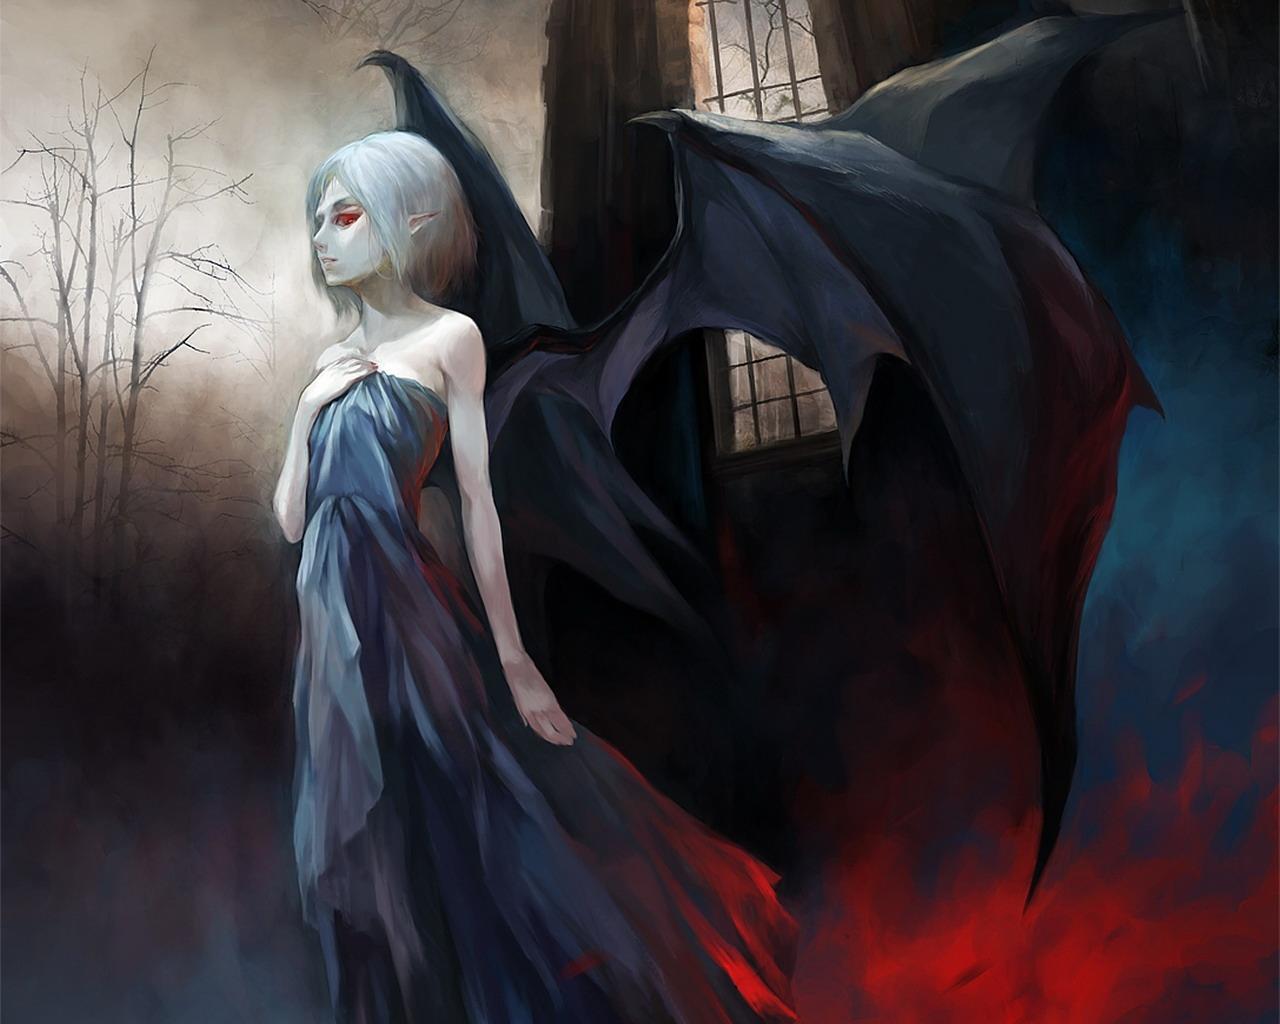 Fantasy Art Vampires Wallpapers Hd Desktop And Mobile: Wallpaper : Painting, Illustration, Anime, Wings, Demon